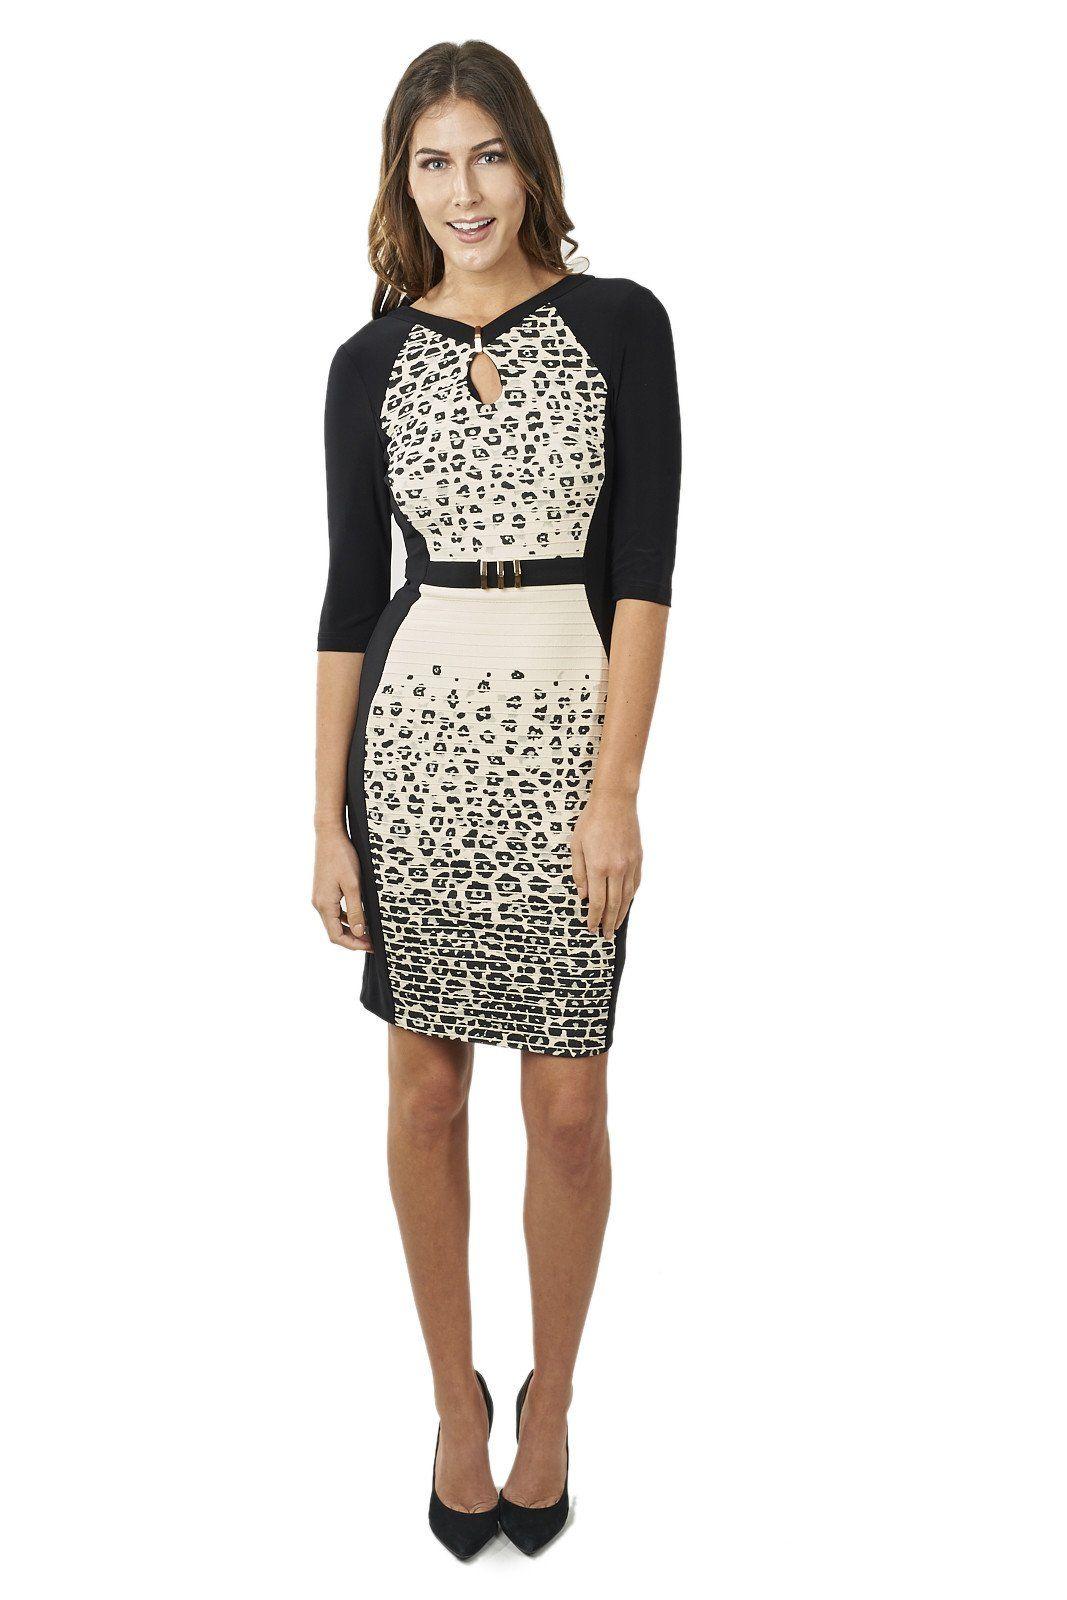 Cheetah Print Long Sleeve Dress Long Sleeve Print Dress Long Sleeve Dress Dresses [ 1600 x 1067 Pixel ]